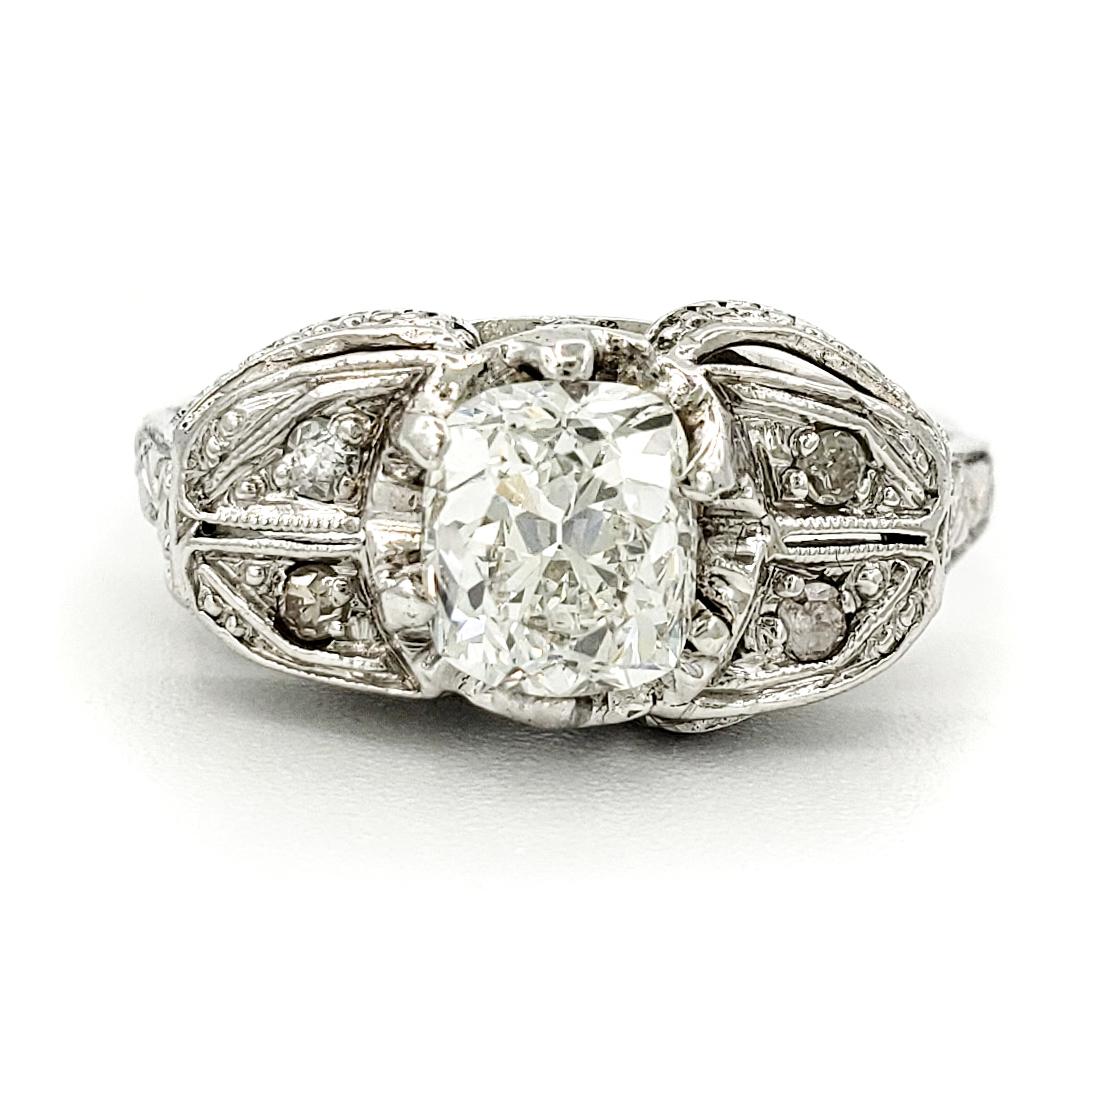 vintage-platinum-engagement-ring-with-0-94-carat-old-mine-cut-diamond-egl-g-si2